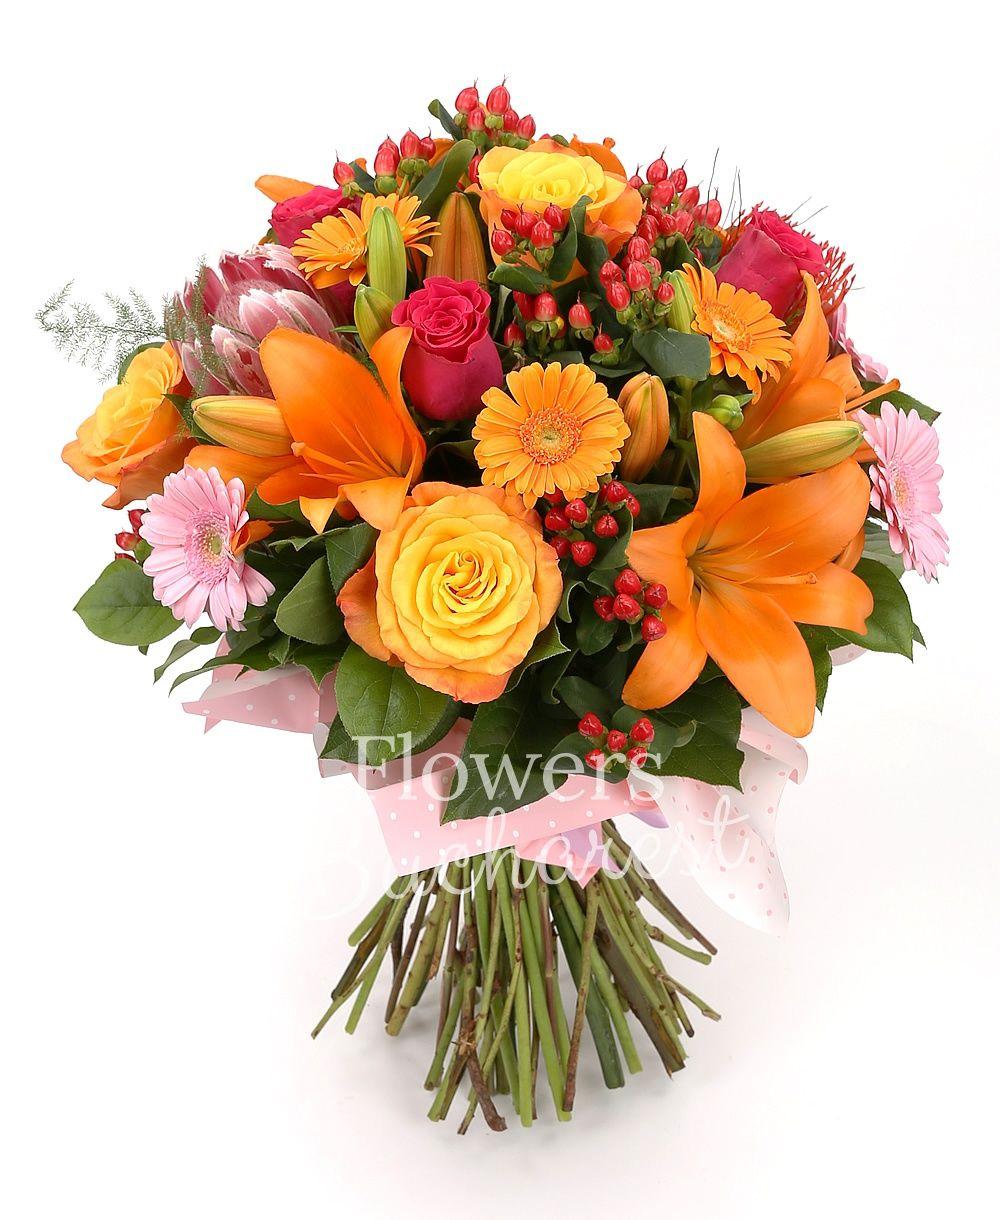 3 orange lilies, 3 proteea, 5 orange roses, 3 cyclam roses, 3 pink gerbera, 5 orange gerbera, 3 leucospermum, 5 hypericum, greenery